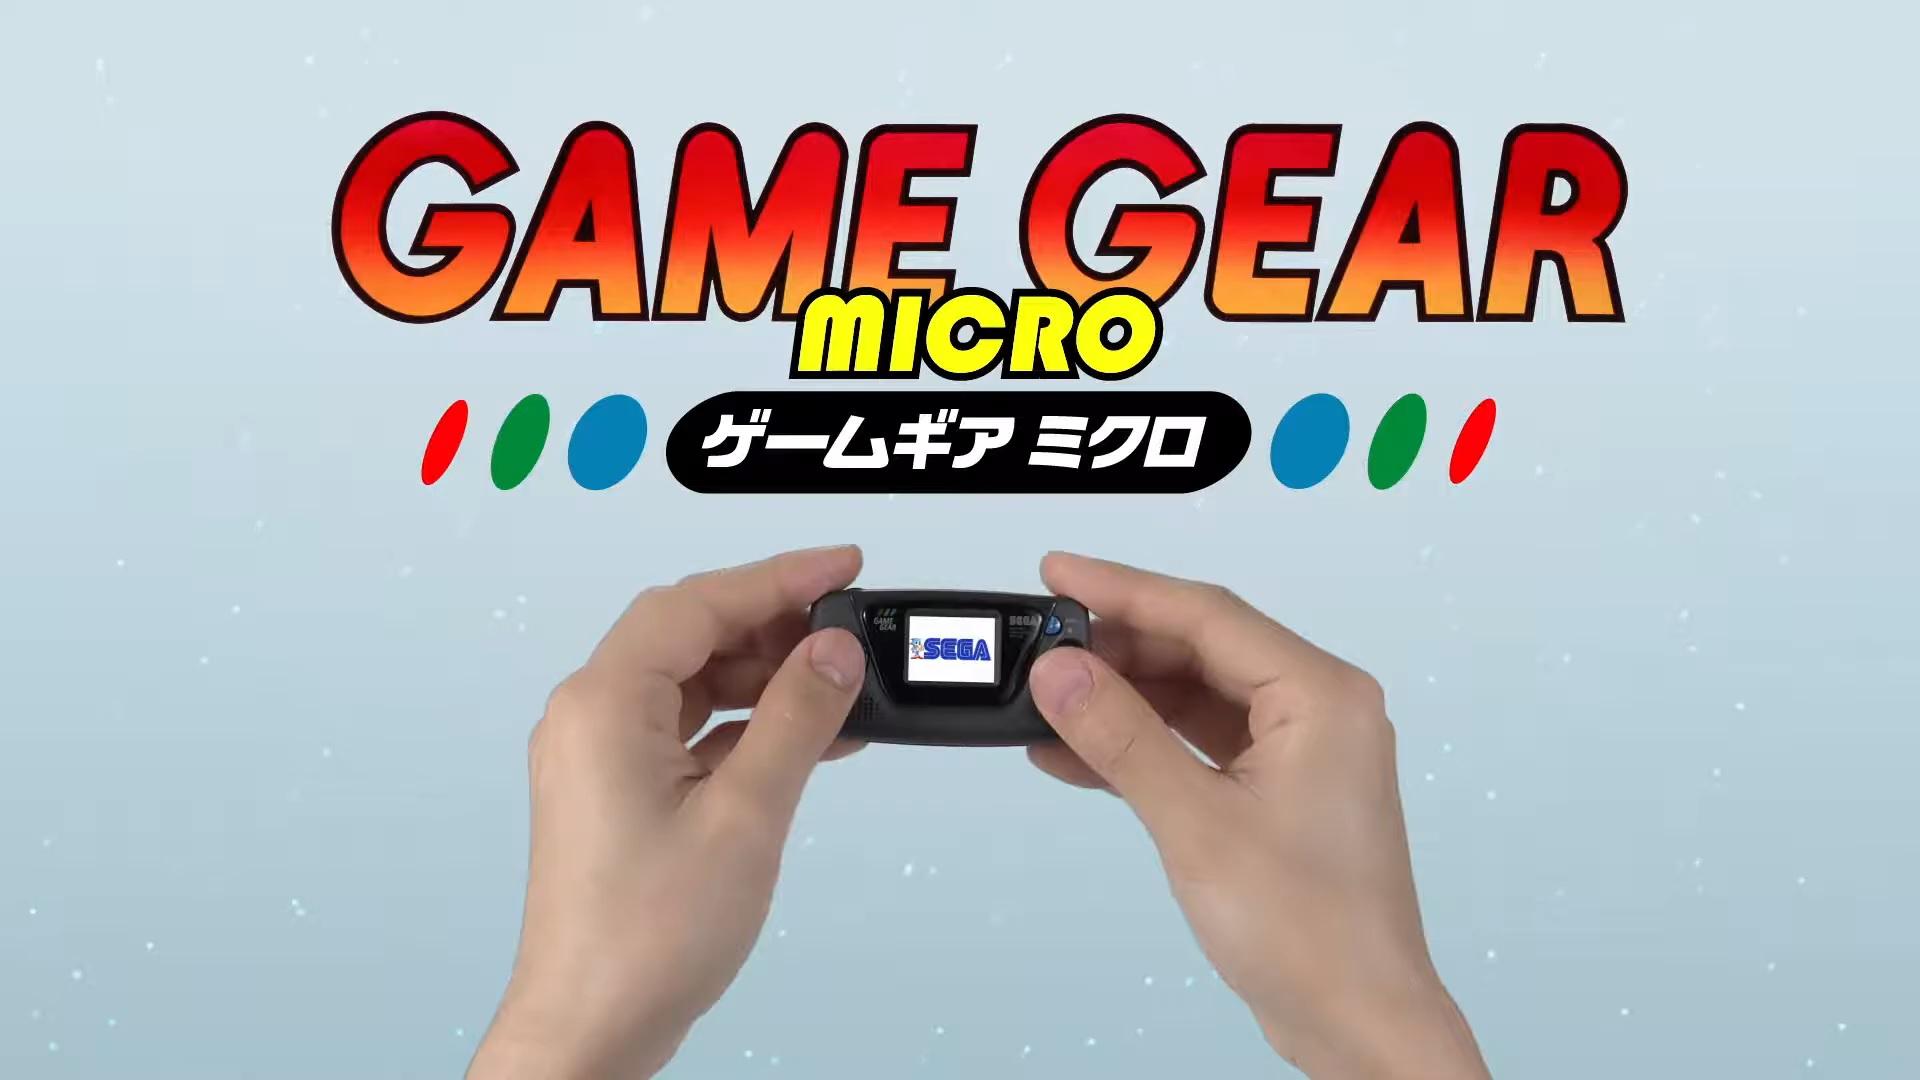 game gear micro trailer